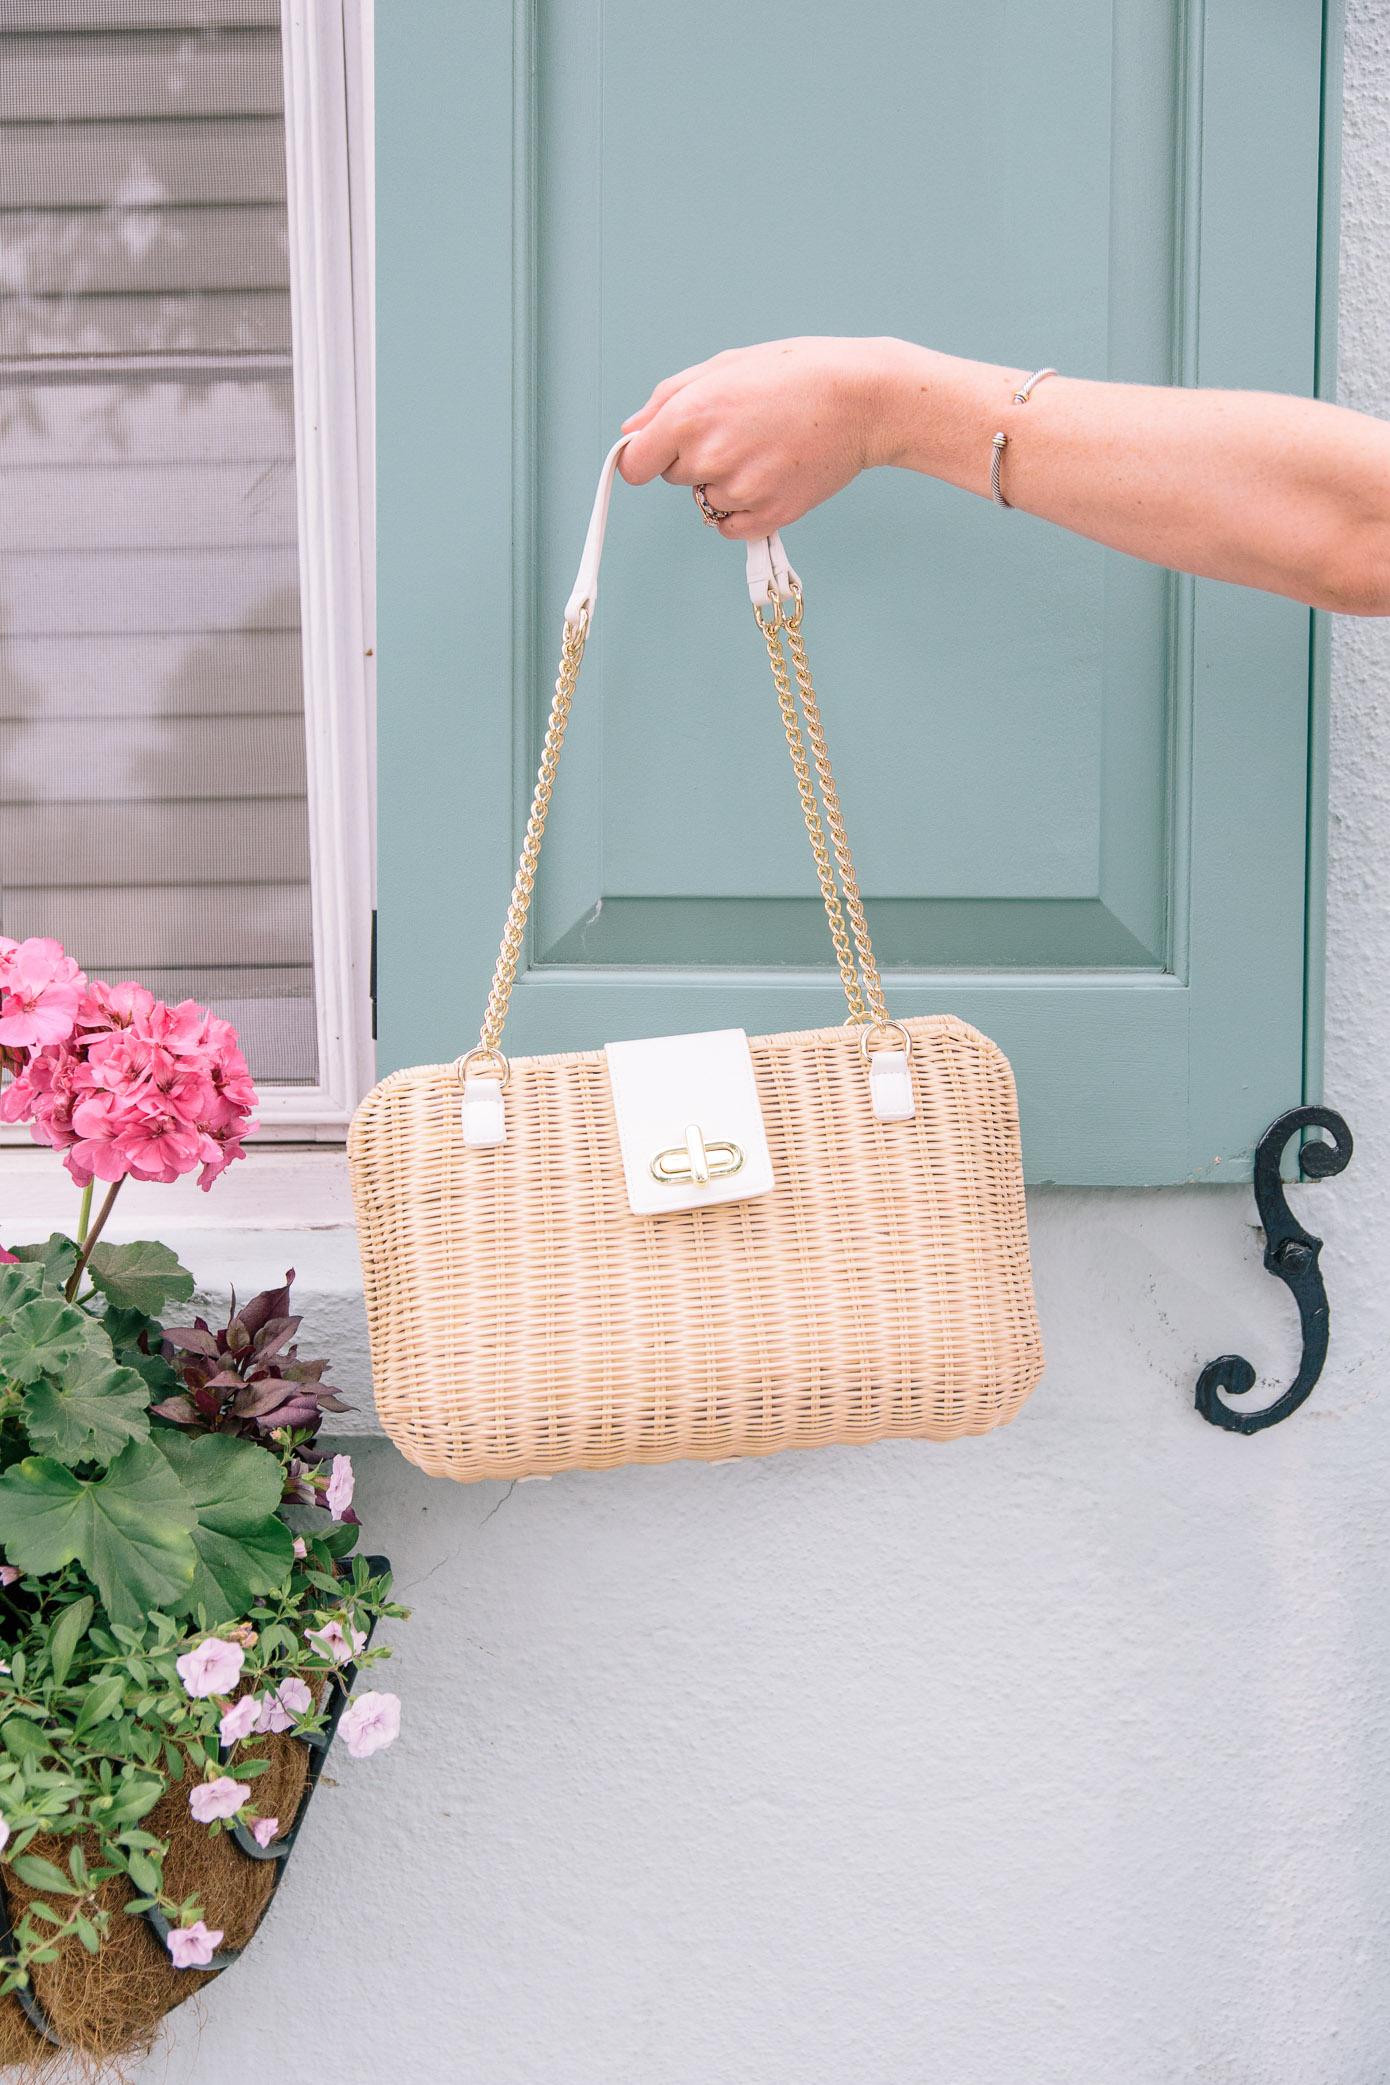 Chic Wicker Handbag | Talbots Friends & Family Event | Louella Reese Life & Style Blog